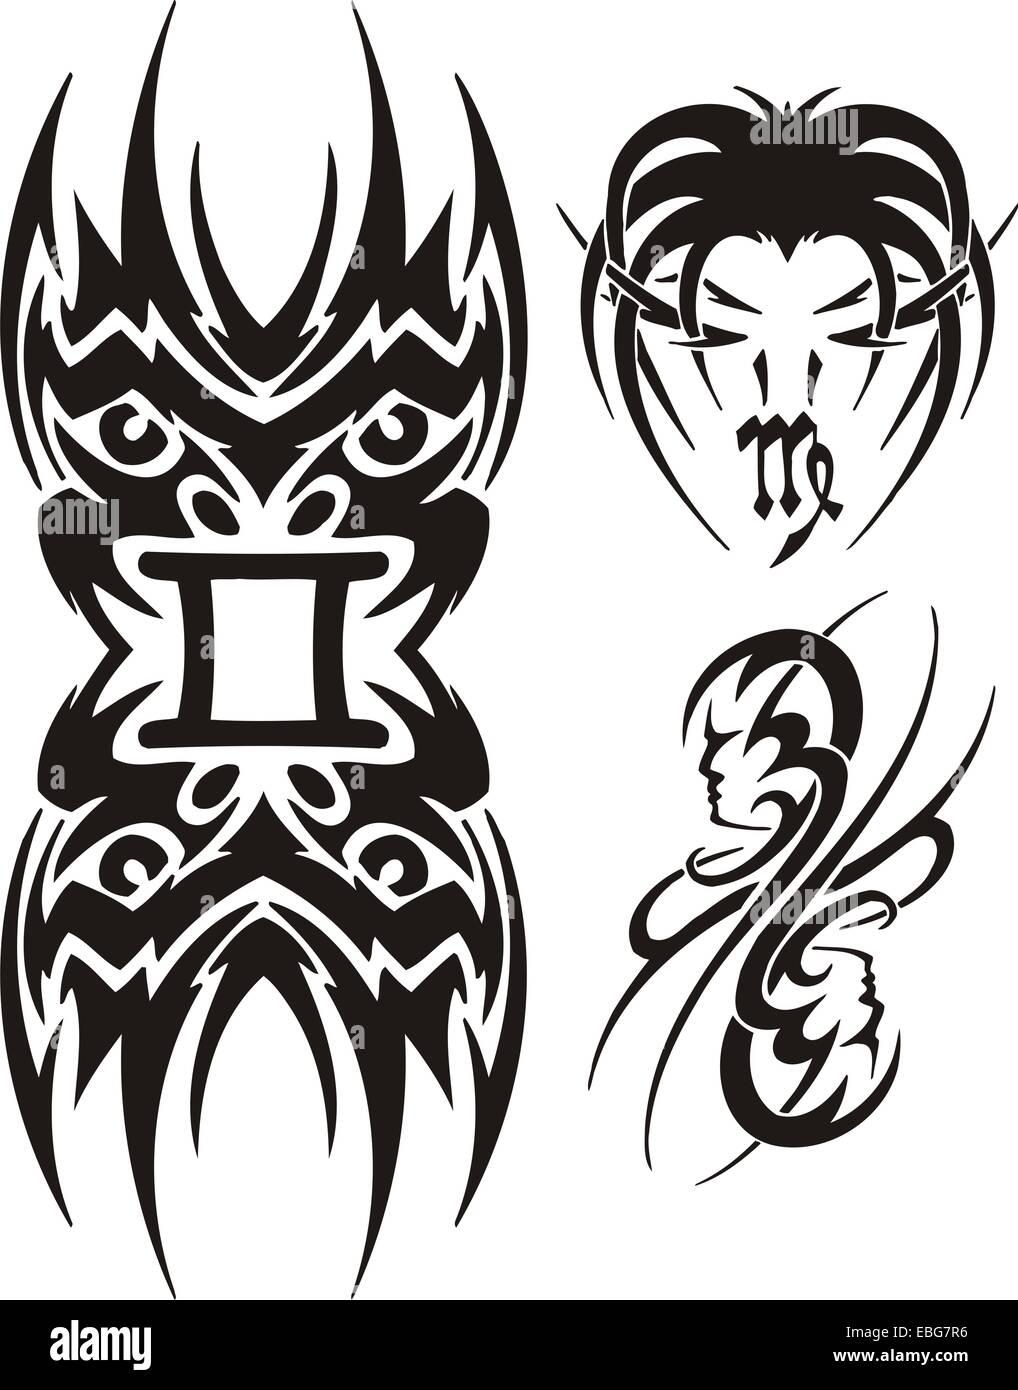 Zodiac Signs - maiden. Vinyl-ready vector set. - Stock Image